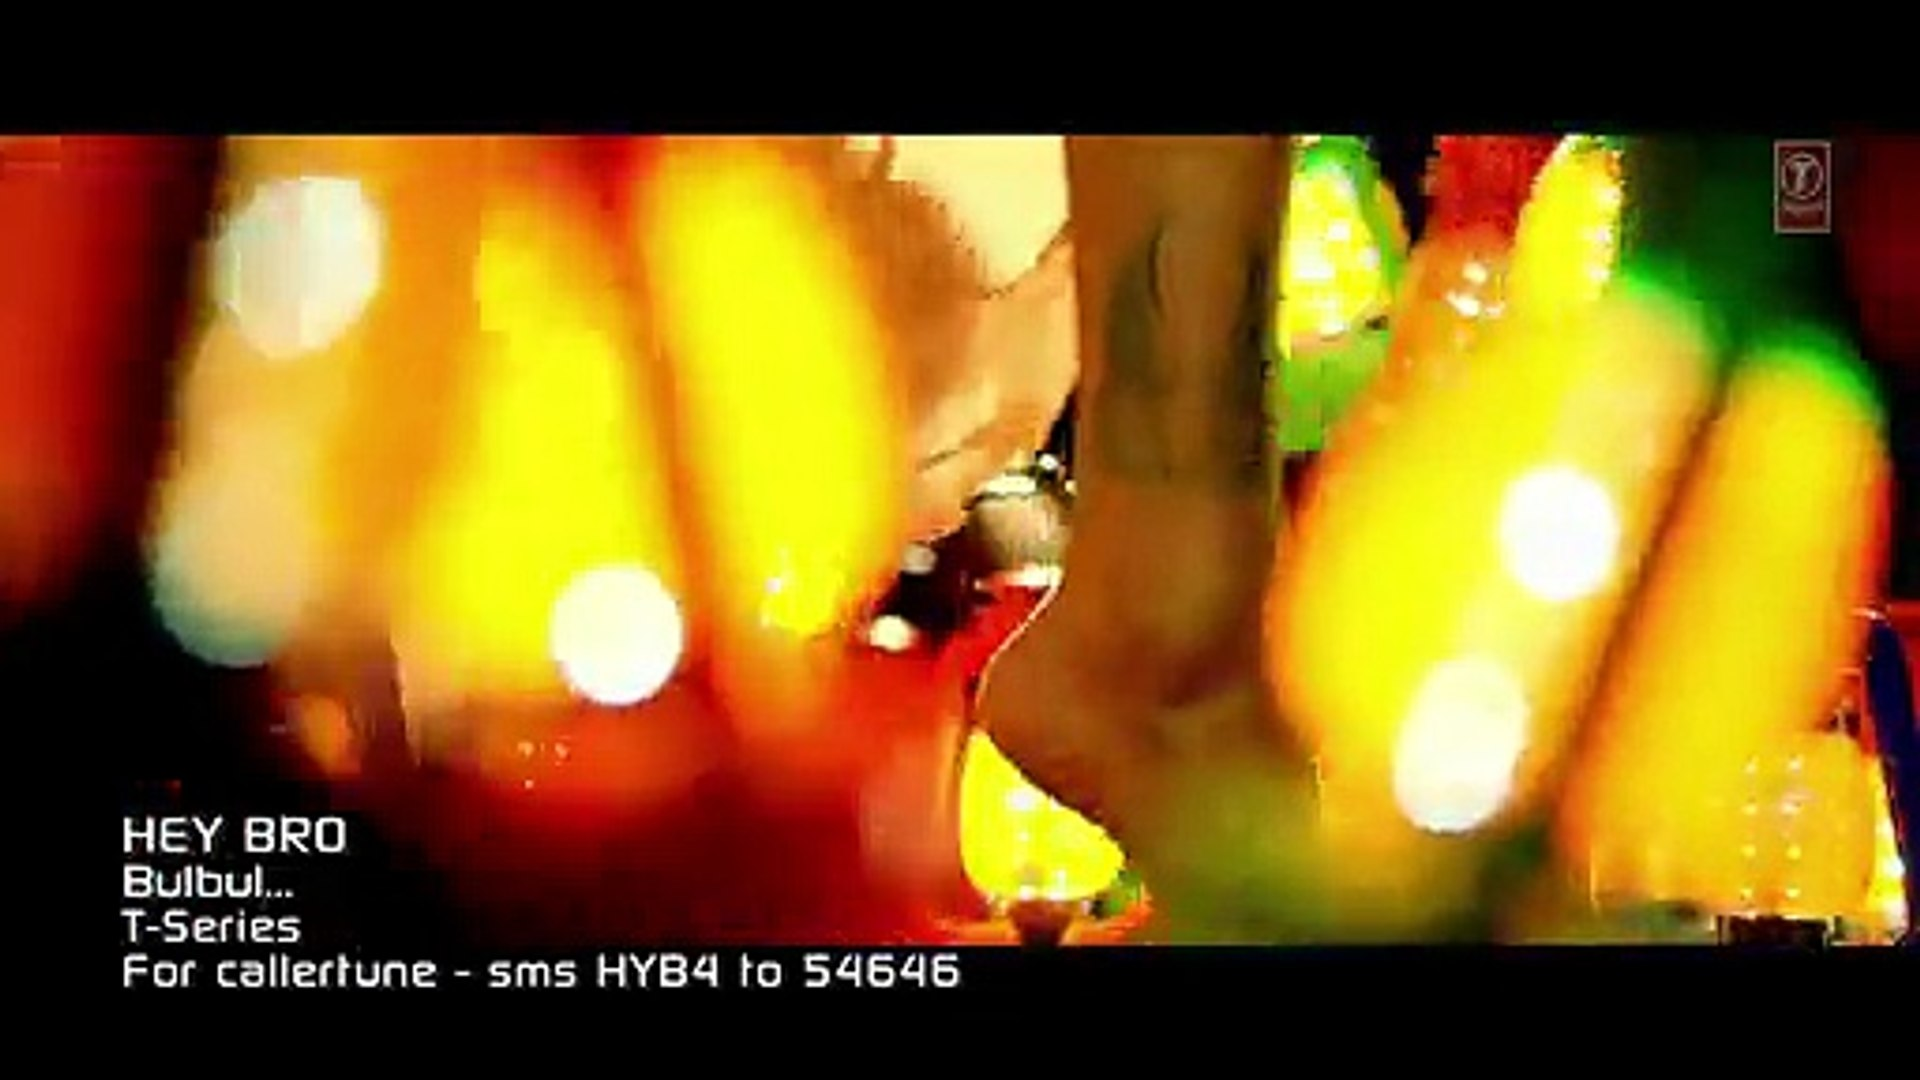 Bulbul Video Song  Hey Bro  Shreya Ghoshal, Feat. Himesh Reshammiya  Ganesh Acharya